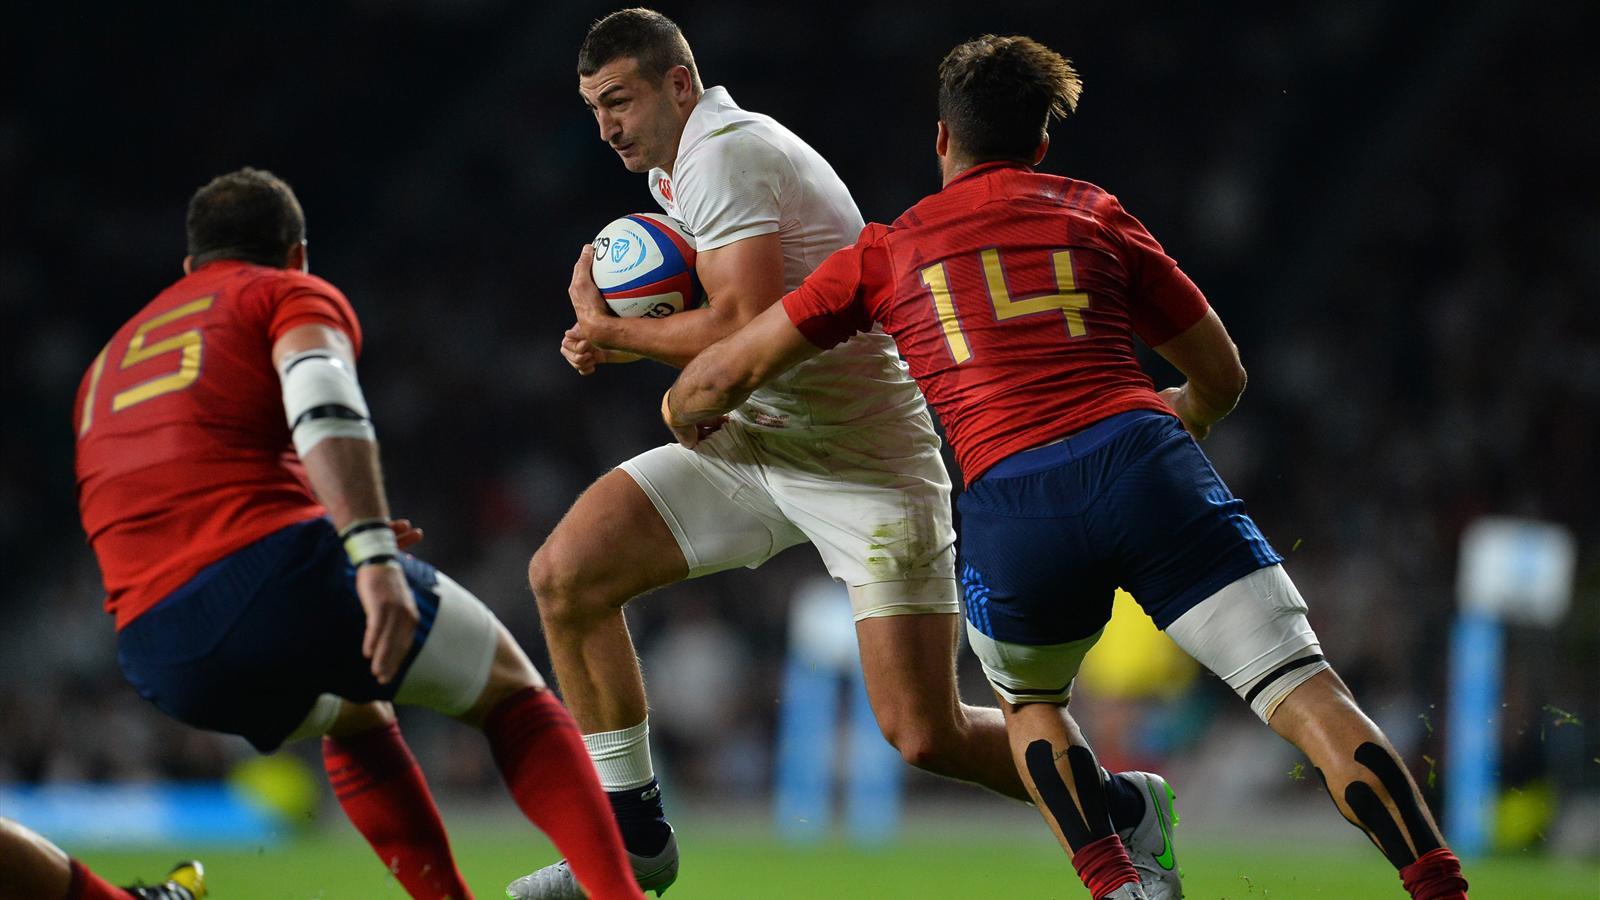 Sofiane Guitoune (XV de France) en difficulté face à Jonny May (Angleterre) - 15 août 2015